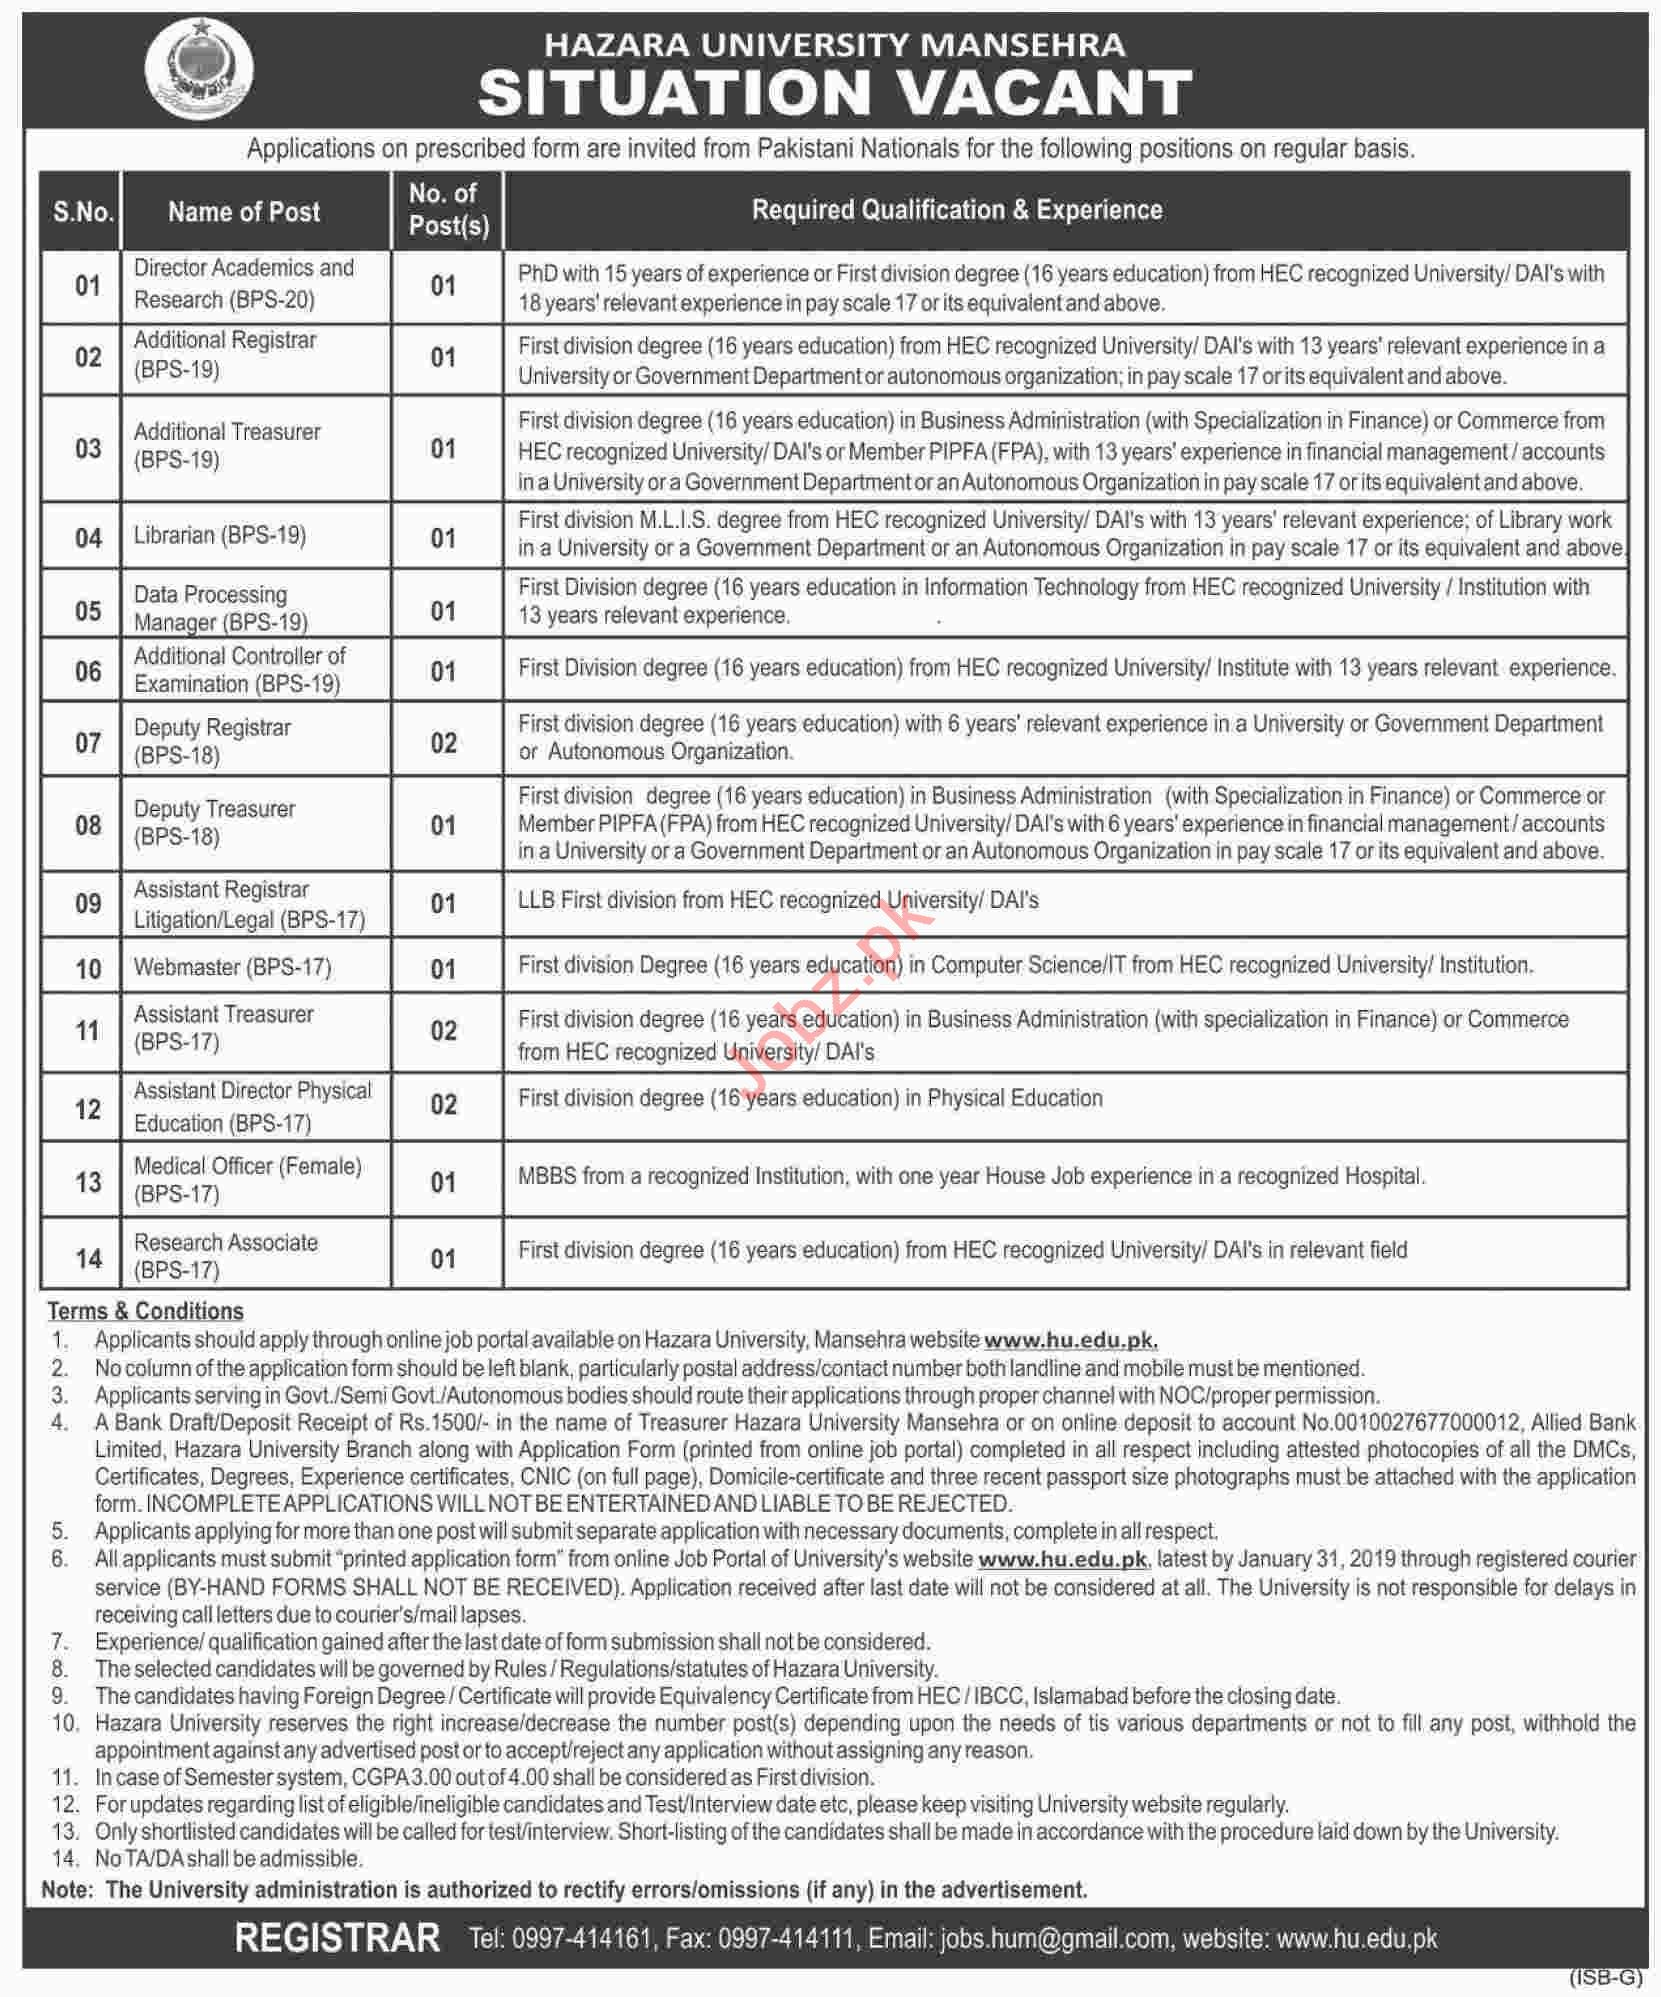 Hazara University Mansehra Administrative Staff Jobs 2019